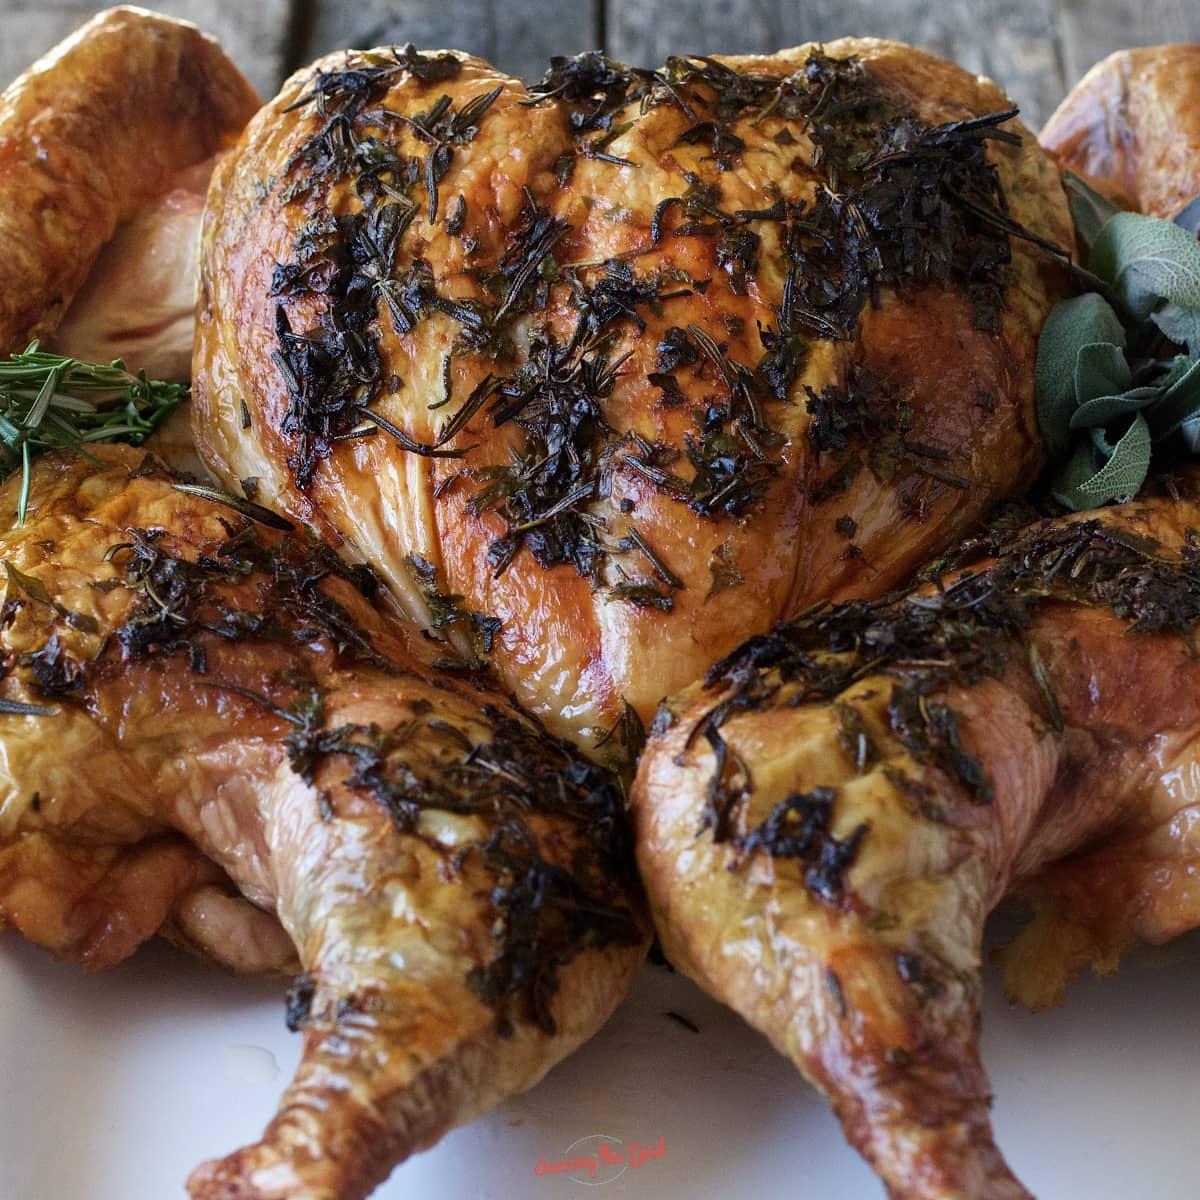 spatchcock turkey roasted golden brown, pressed flat on a serving platter, square image